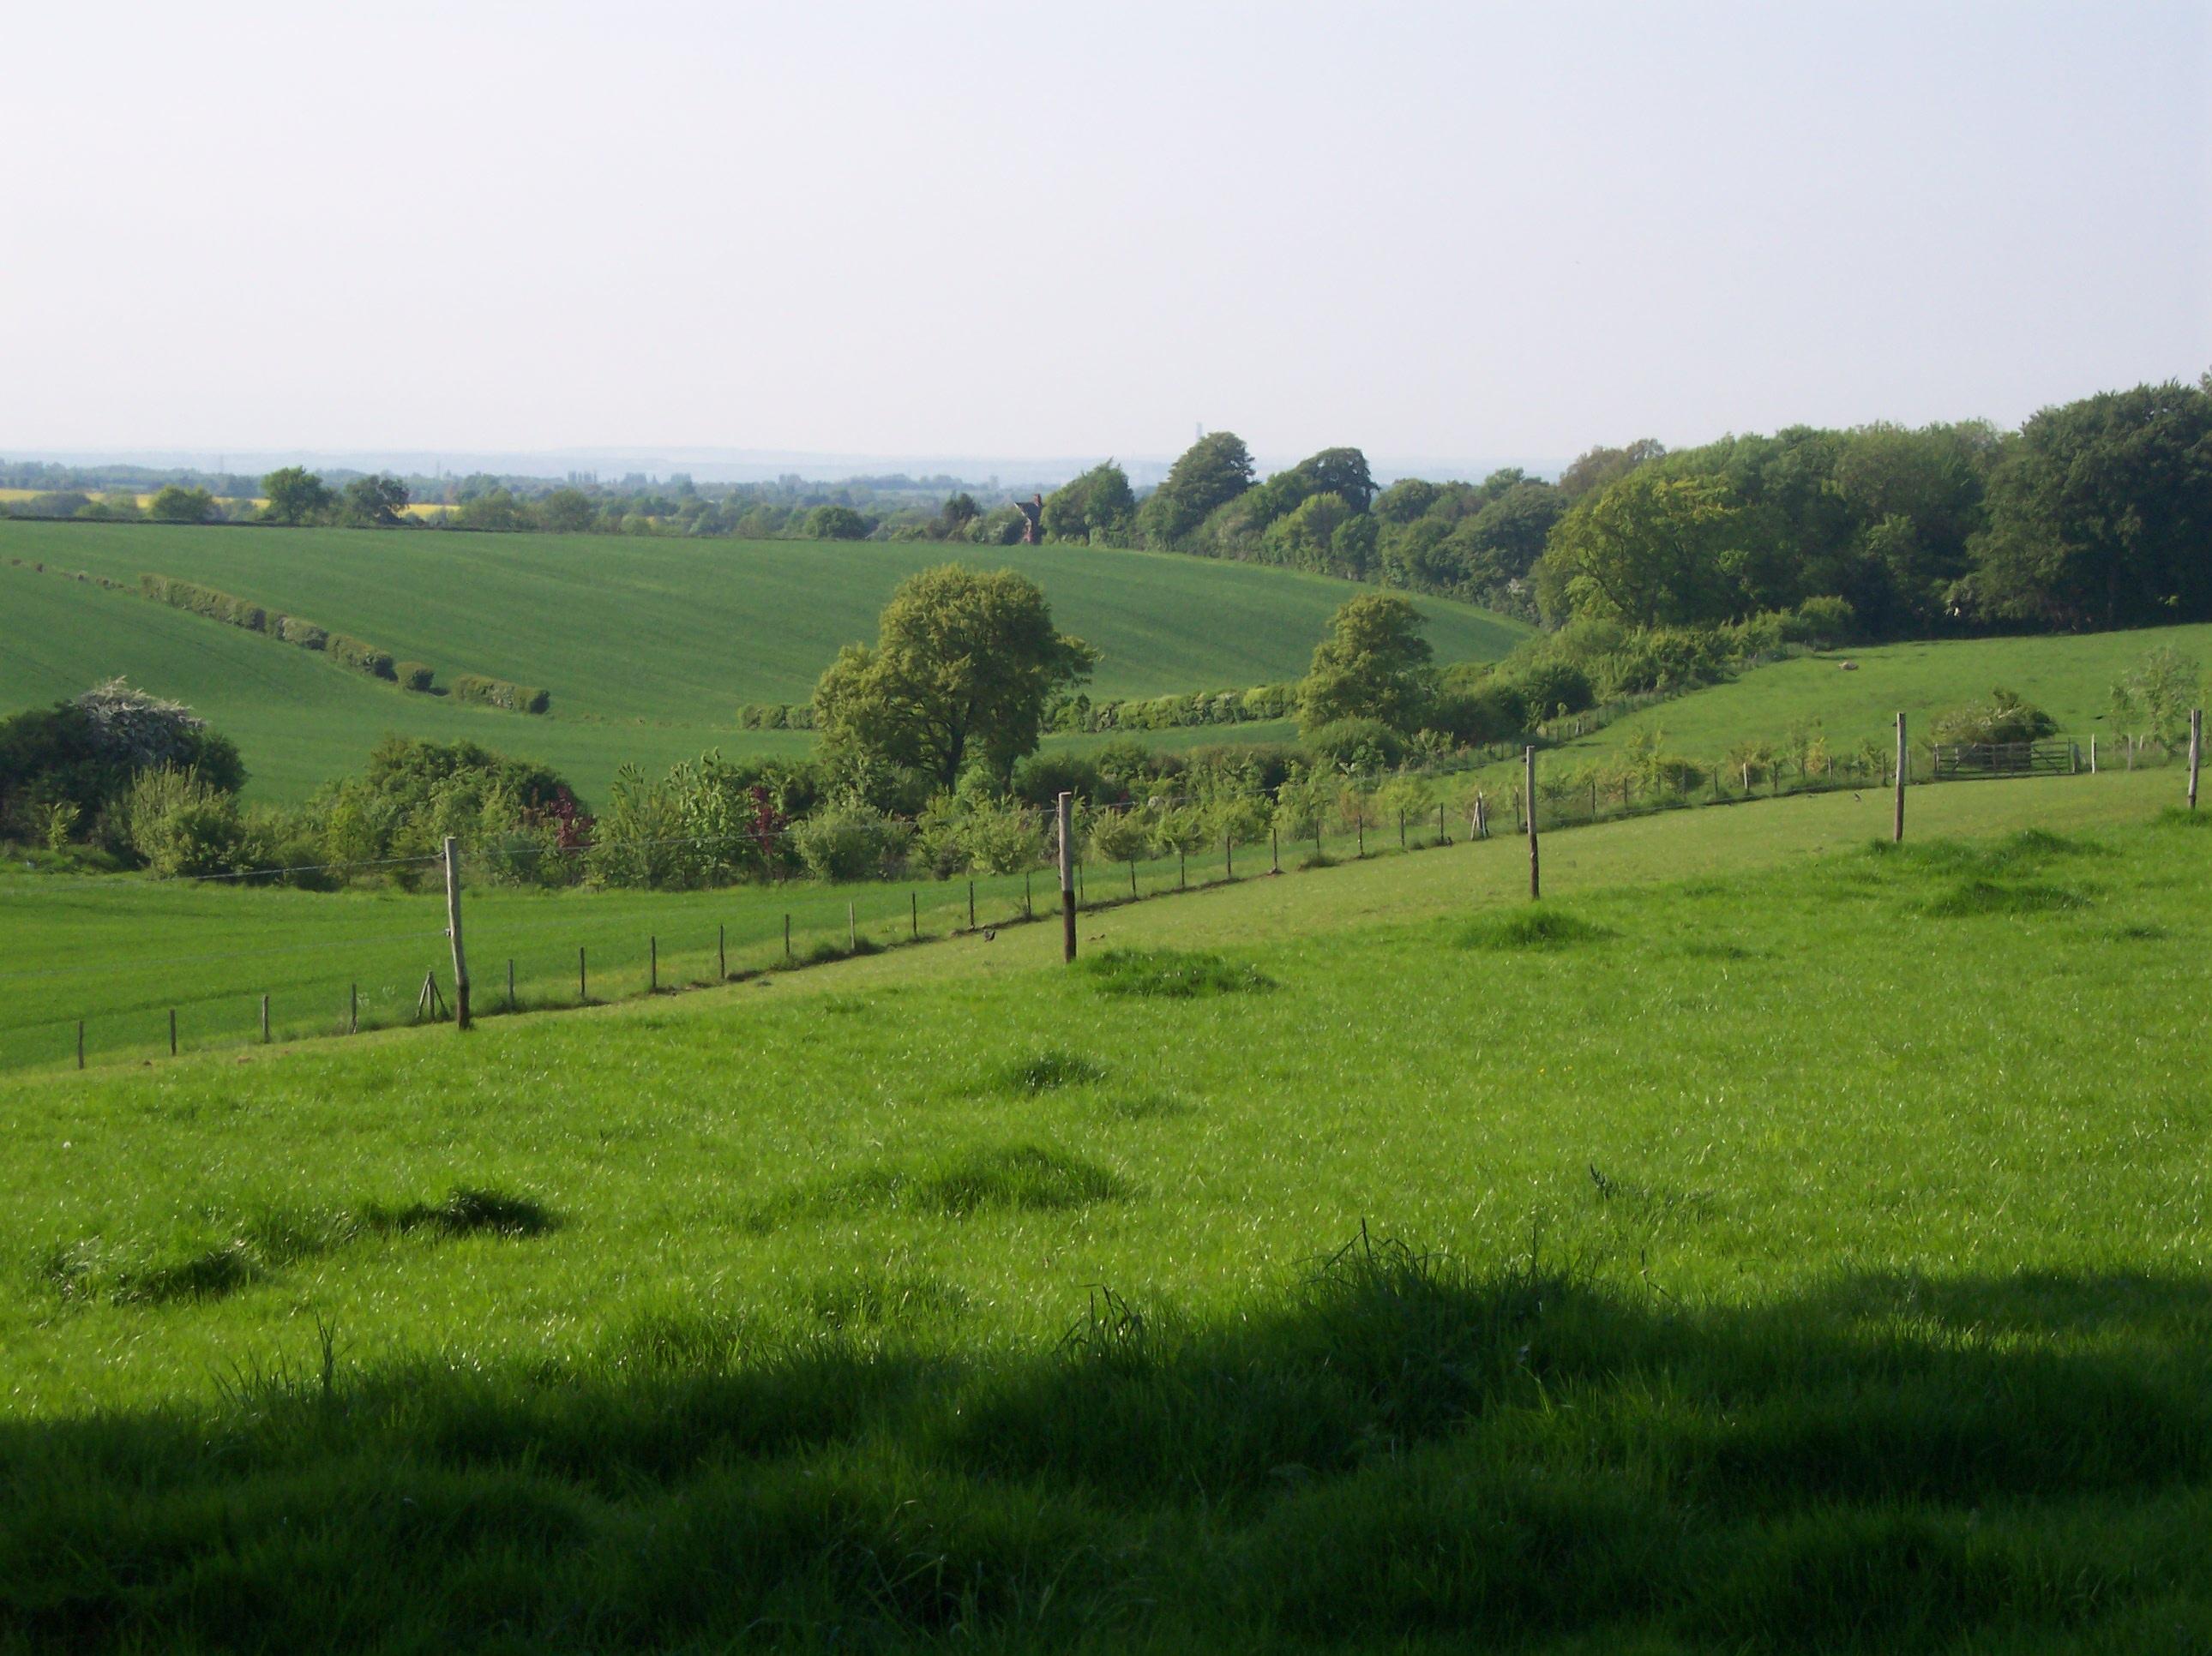 Gambar Pemandangan Alam Outdoor Kayu Bidang Tanah Pertanian